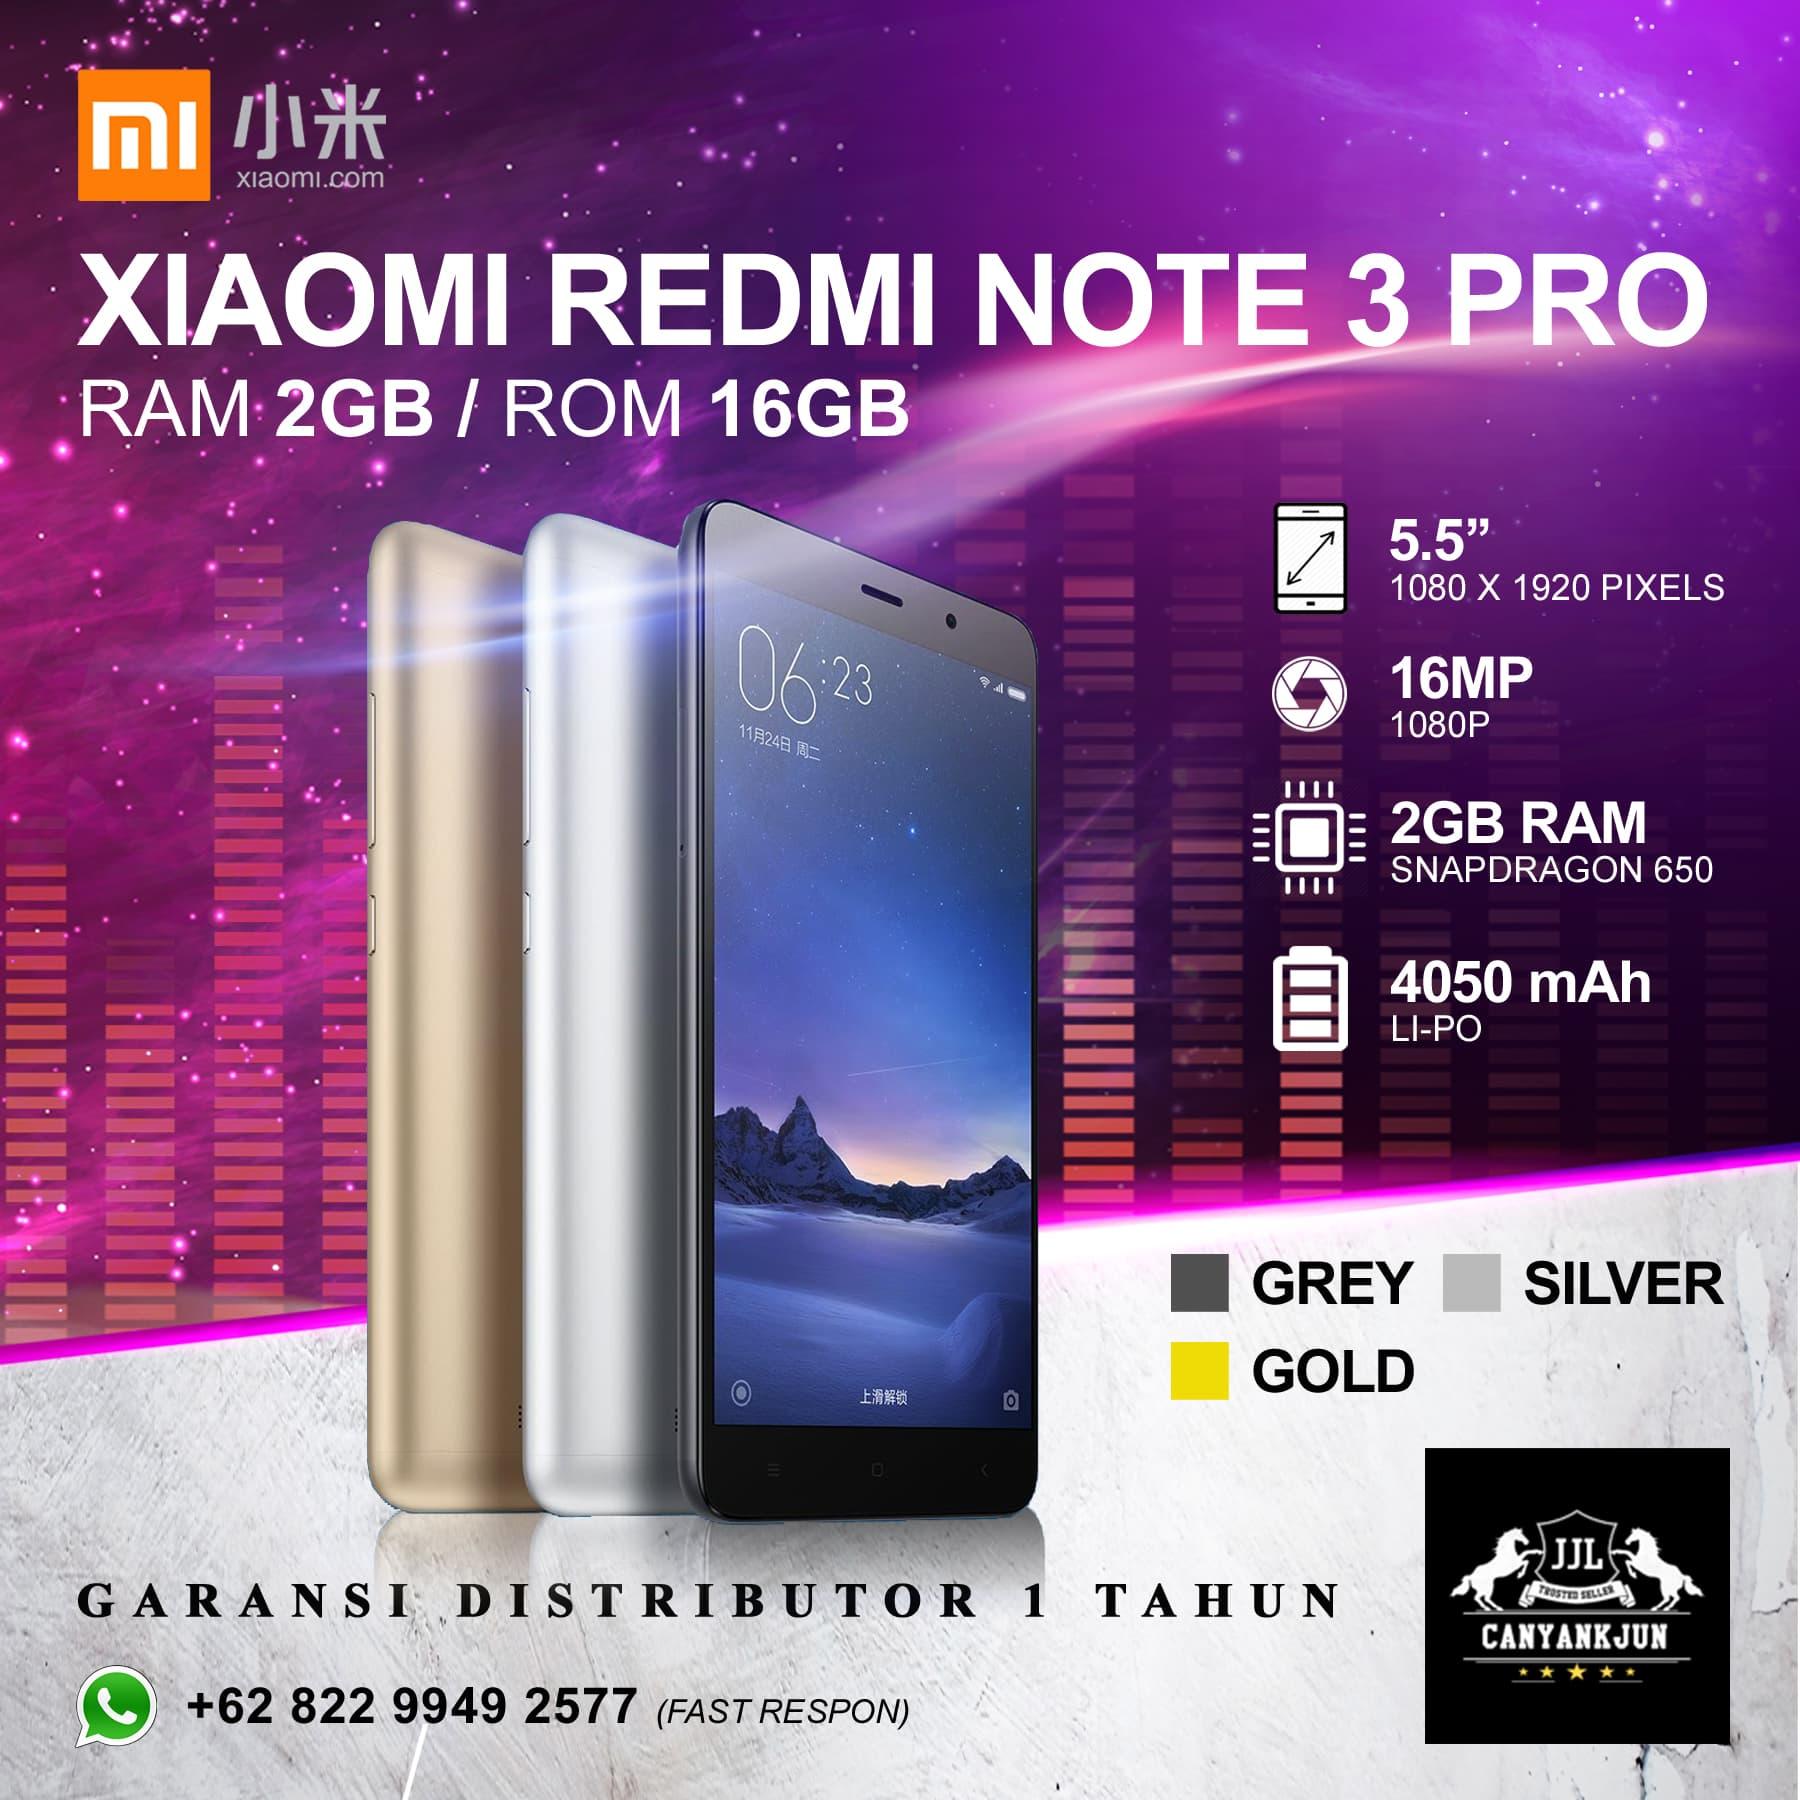 Promo Xiaomi Redmi Note 3 Smartphone Grey 2 Gb 16 Garansi Samsung Galaxy J7 Prime 55ampquot Lte Dual Sim Smart Phone 32gb Jual Pro Gold Ram 2gb 16gb Distri 1